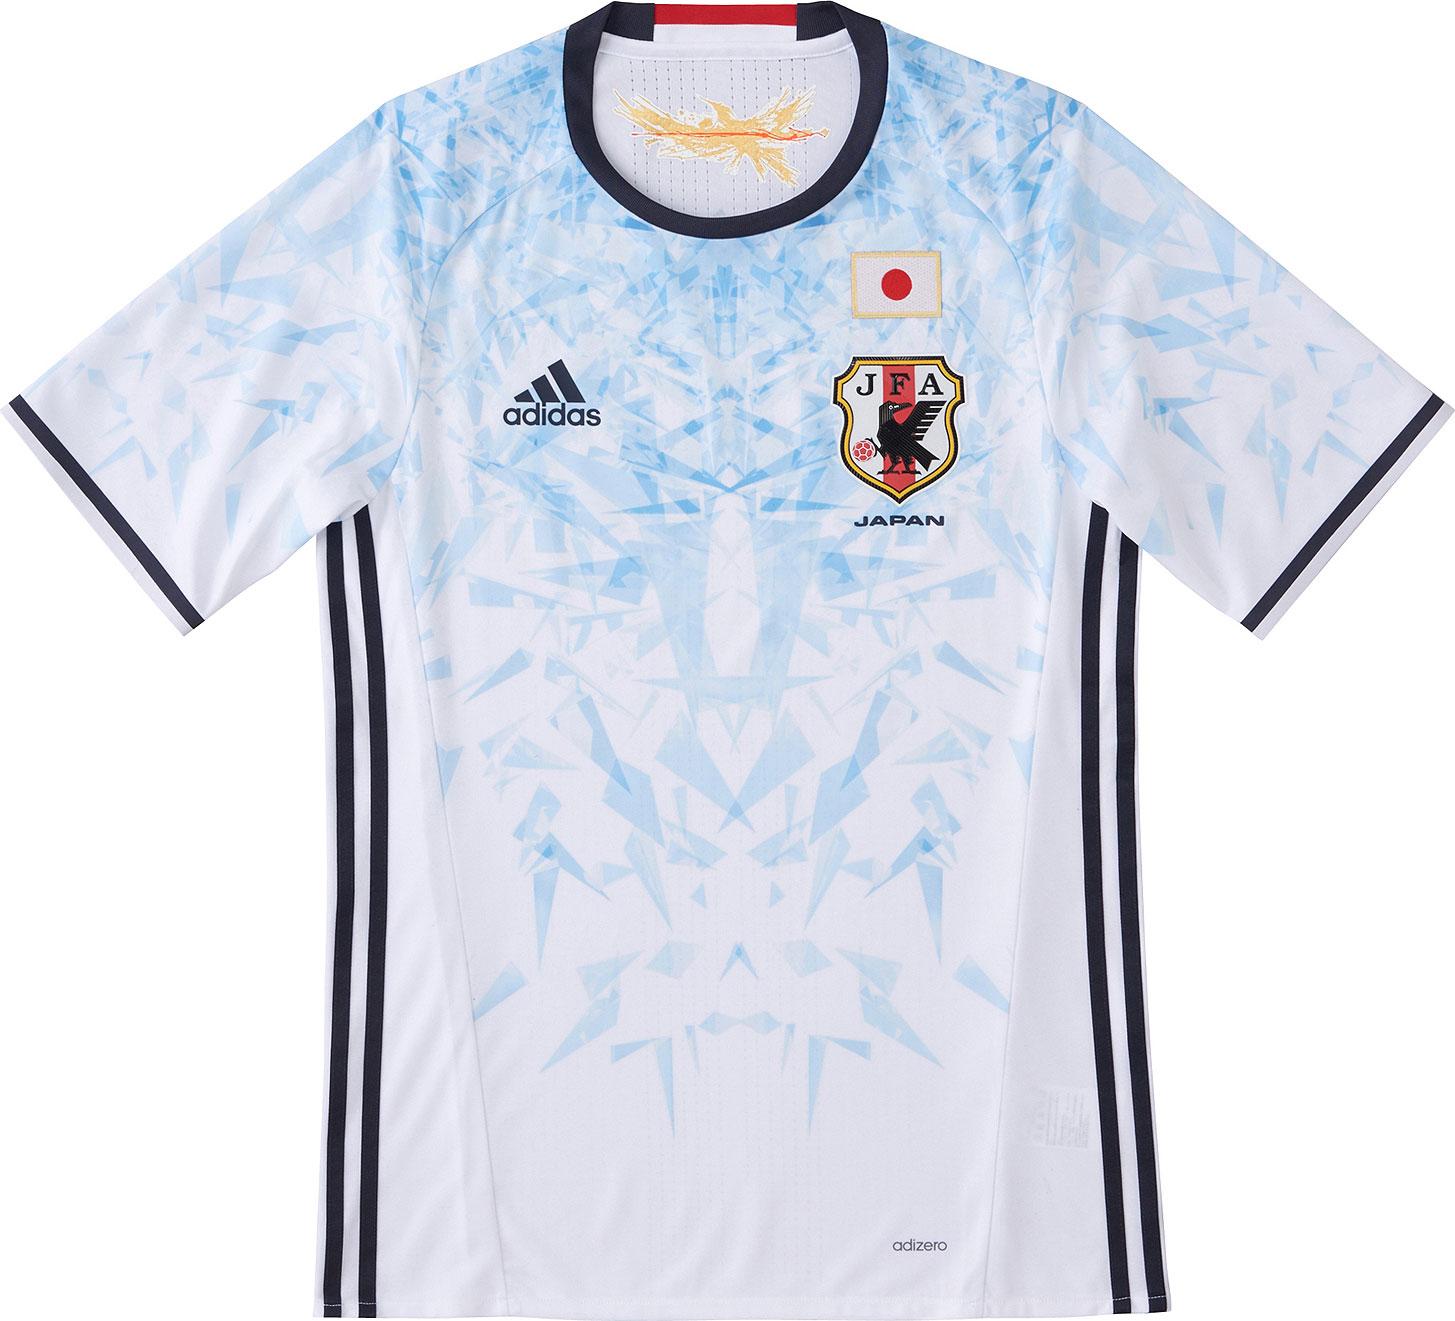 3d17e37c41ab4 Adidas Japan 2016 Home and Away Jerseys